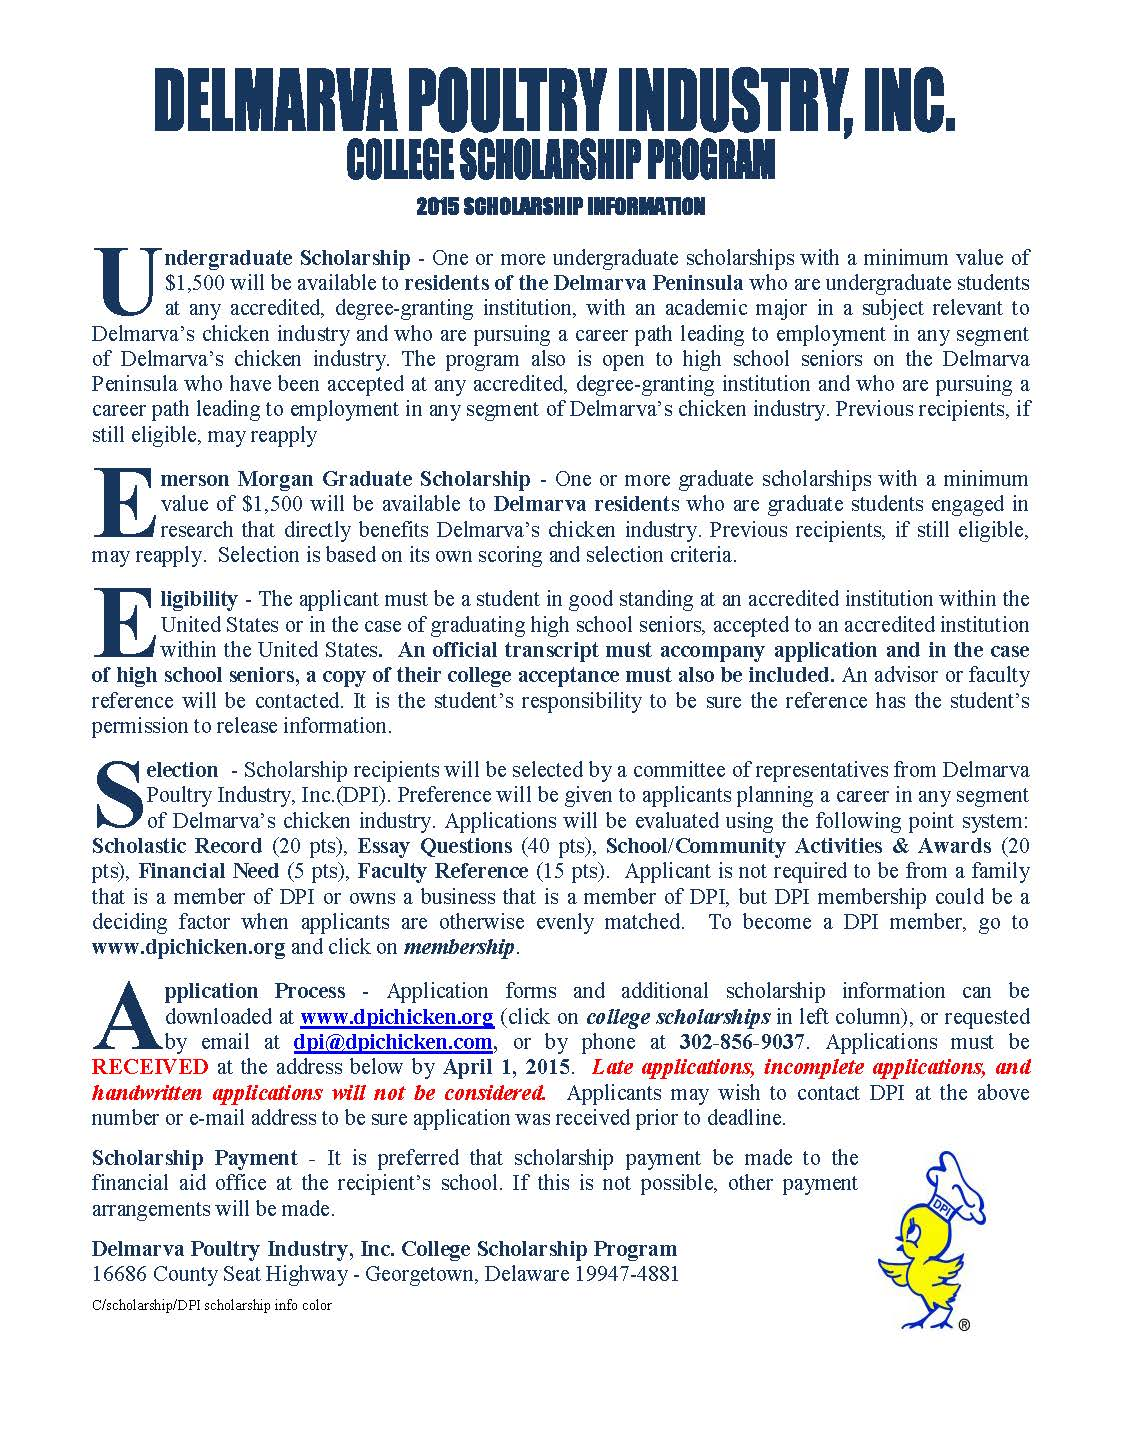 DPI scholarship info color